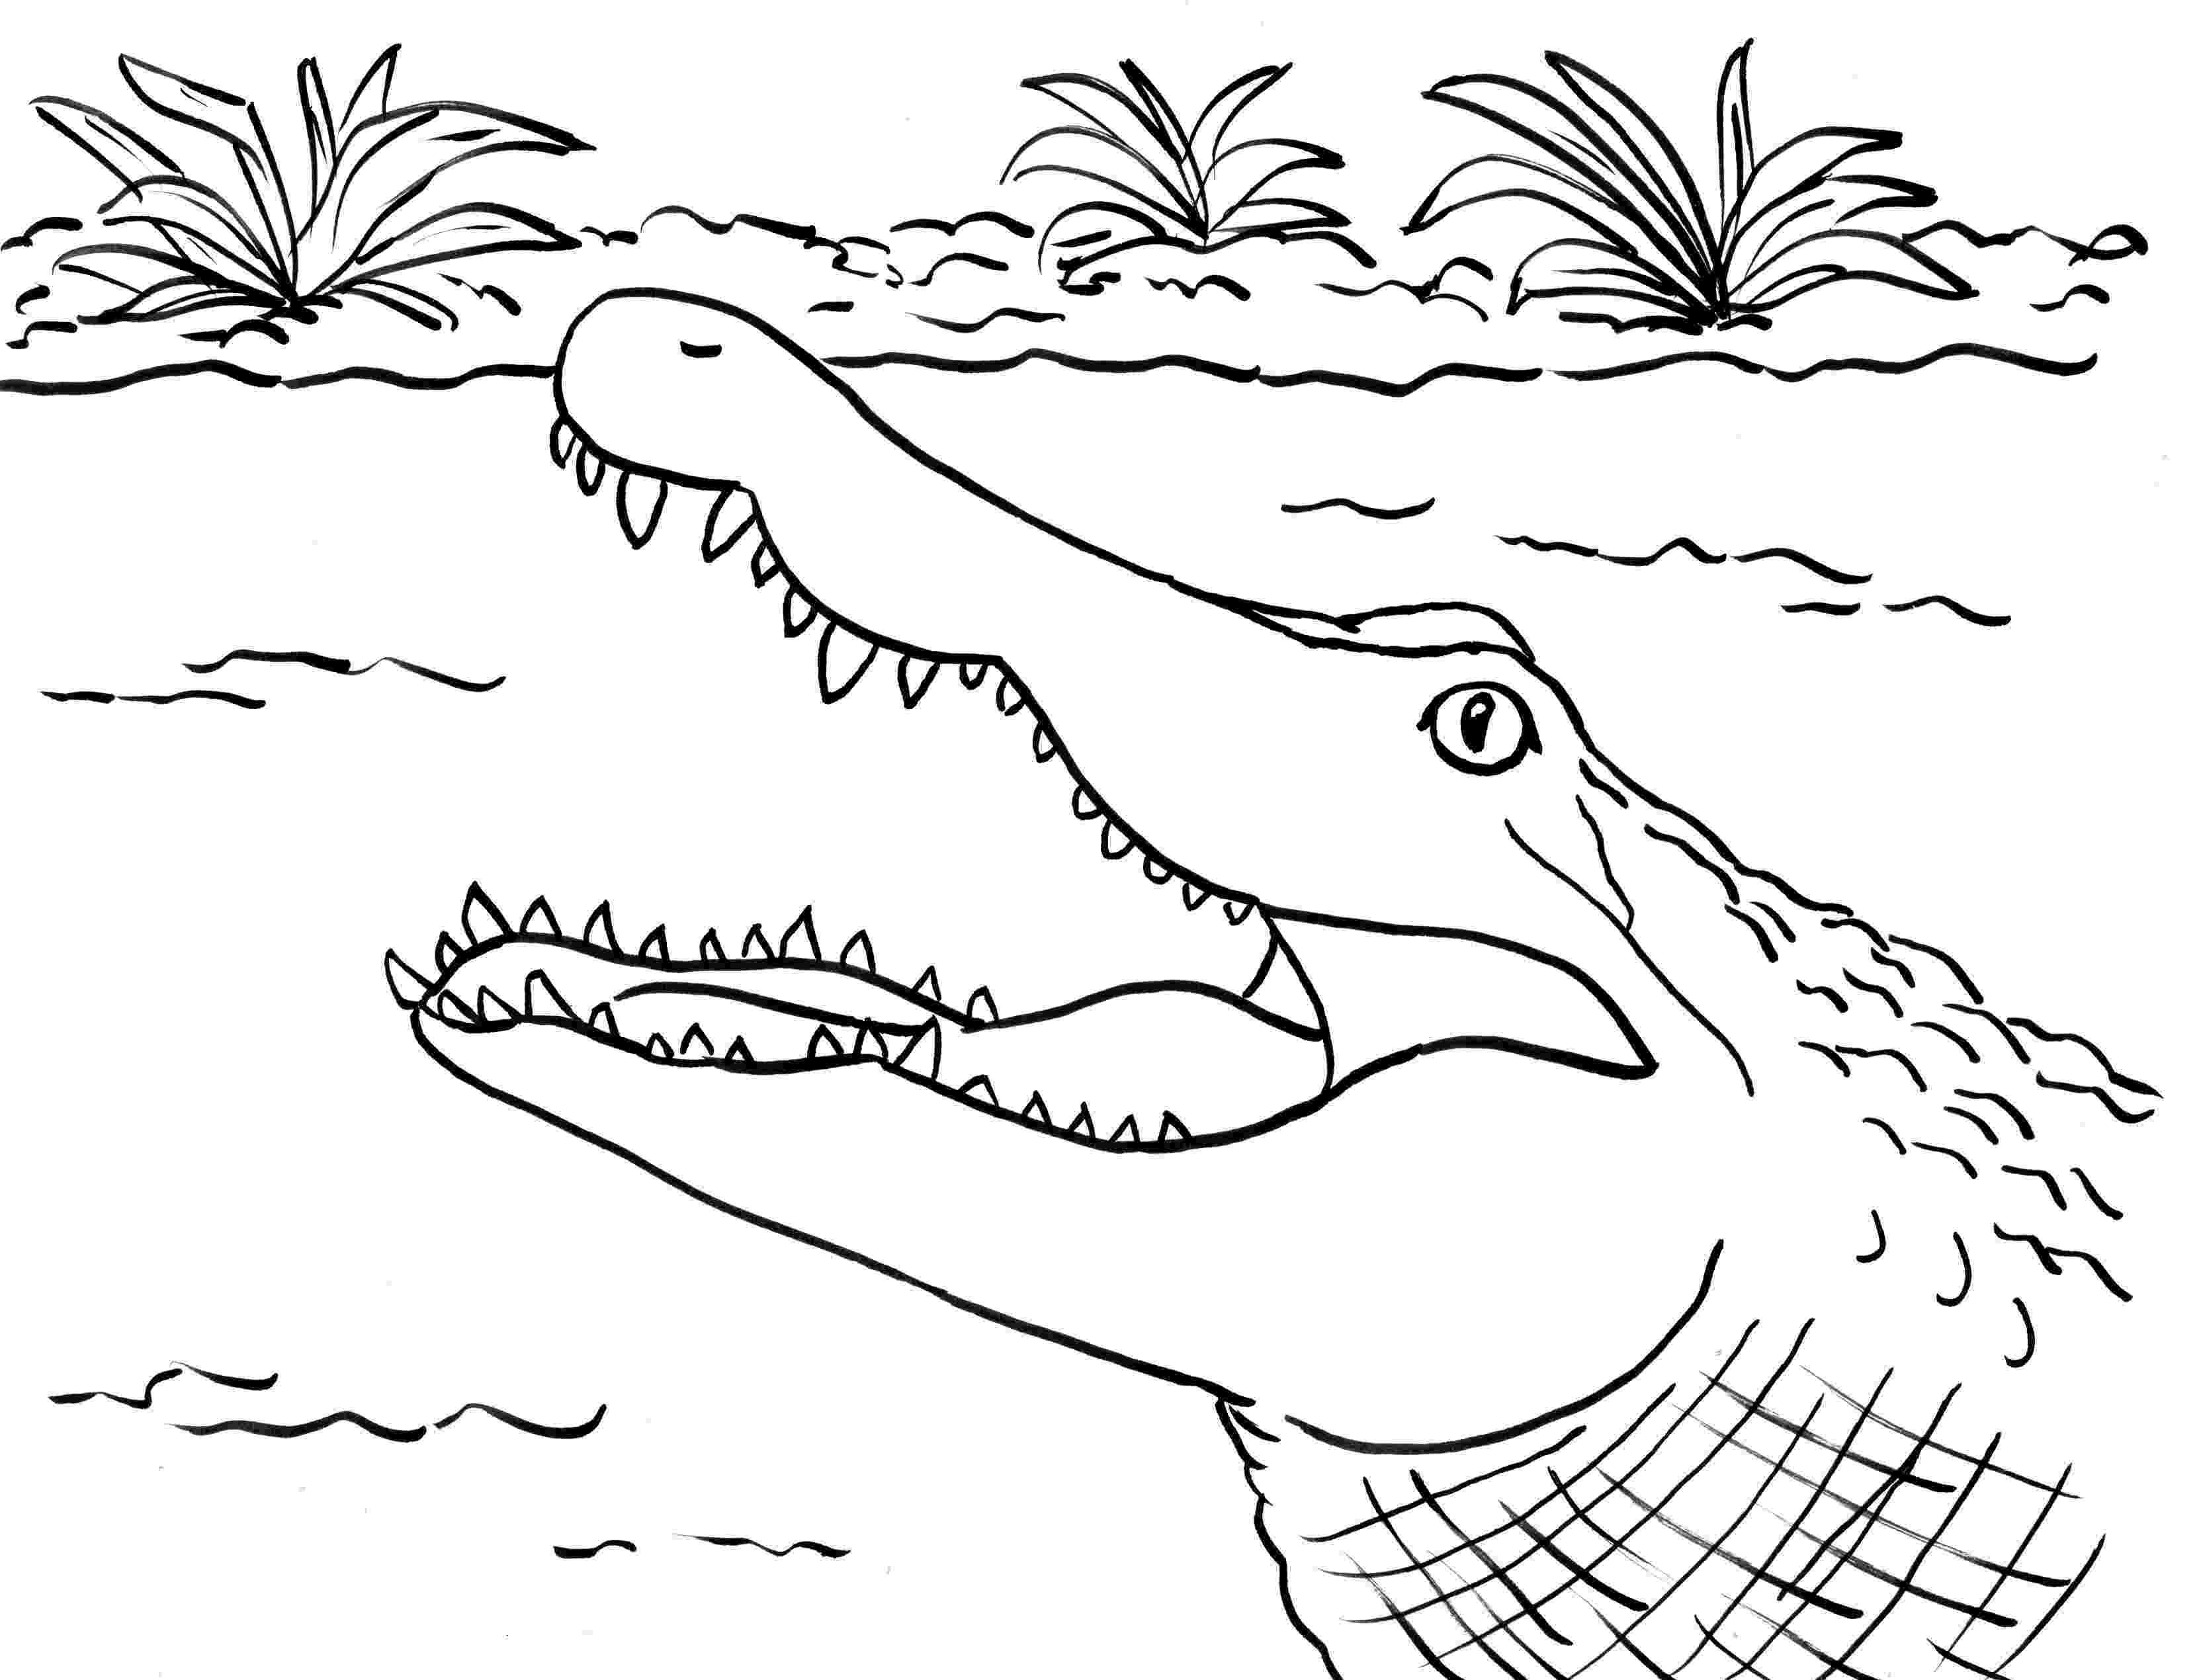 alligator coloring pages alligator coloring page samantha bell coloring alligator pages